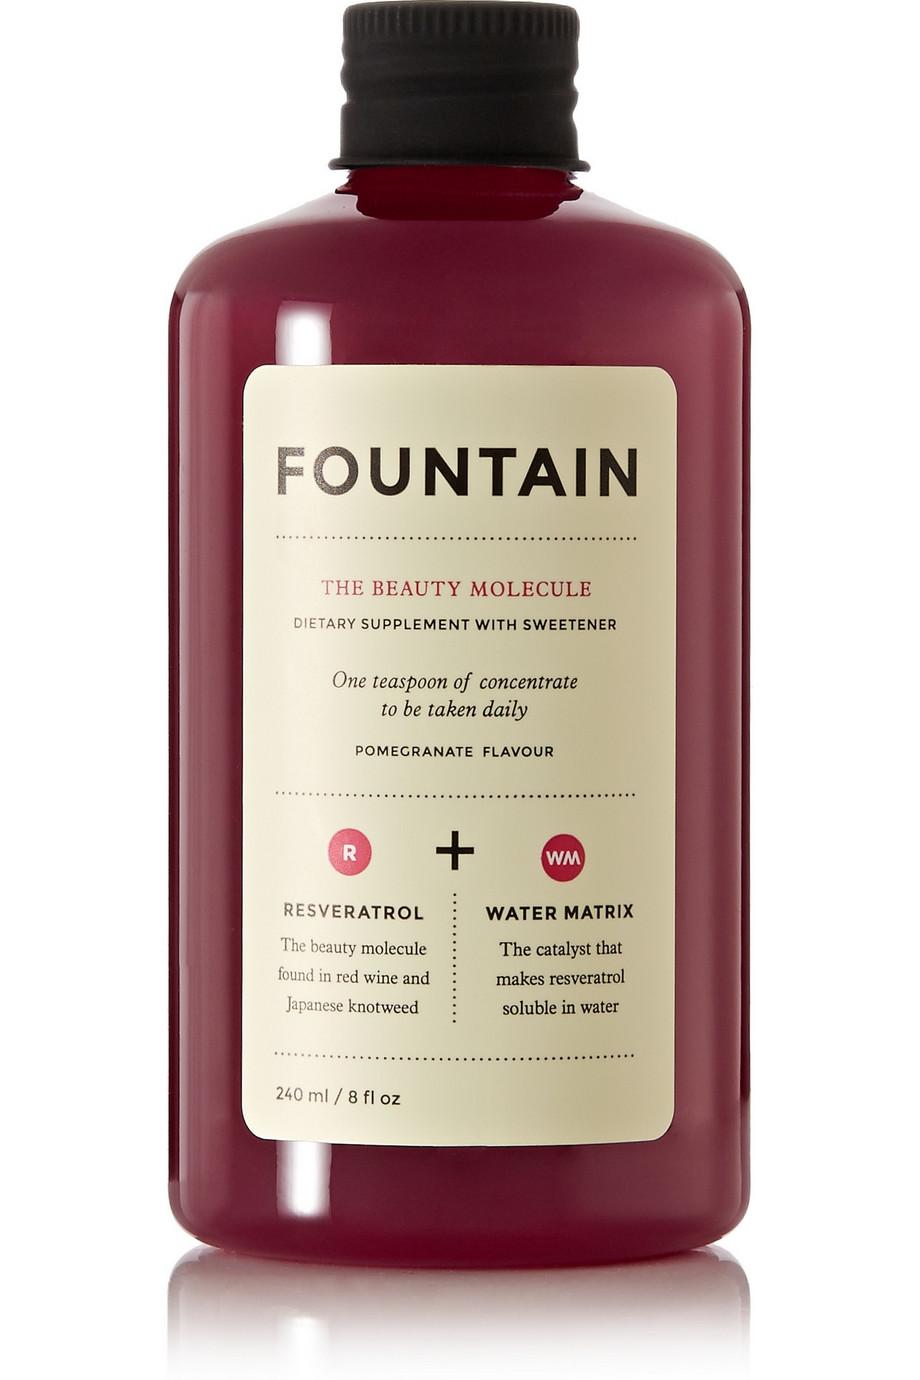 Fountain The Beauty Molecule, 240ml